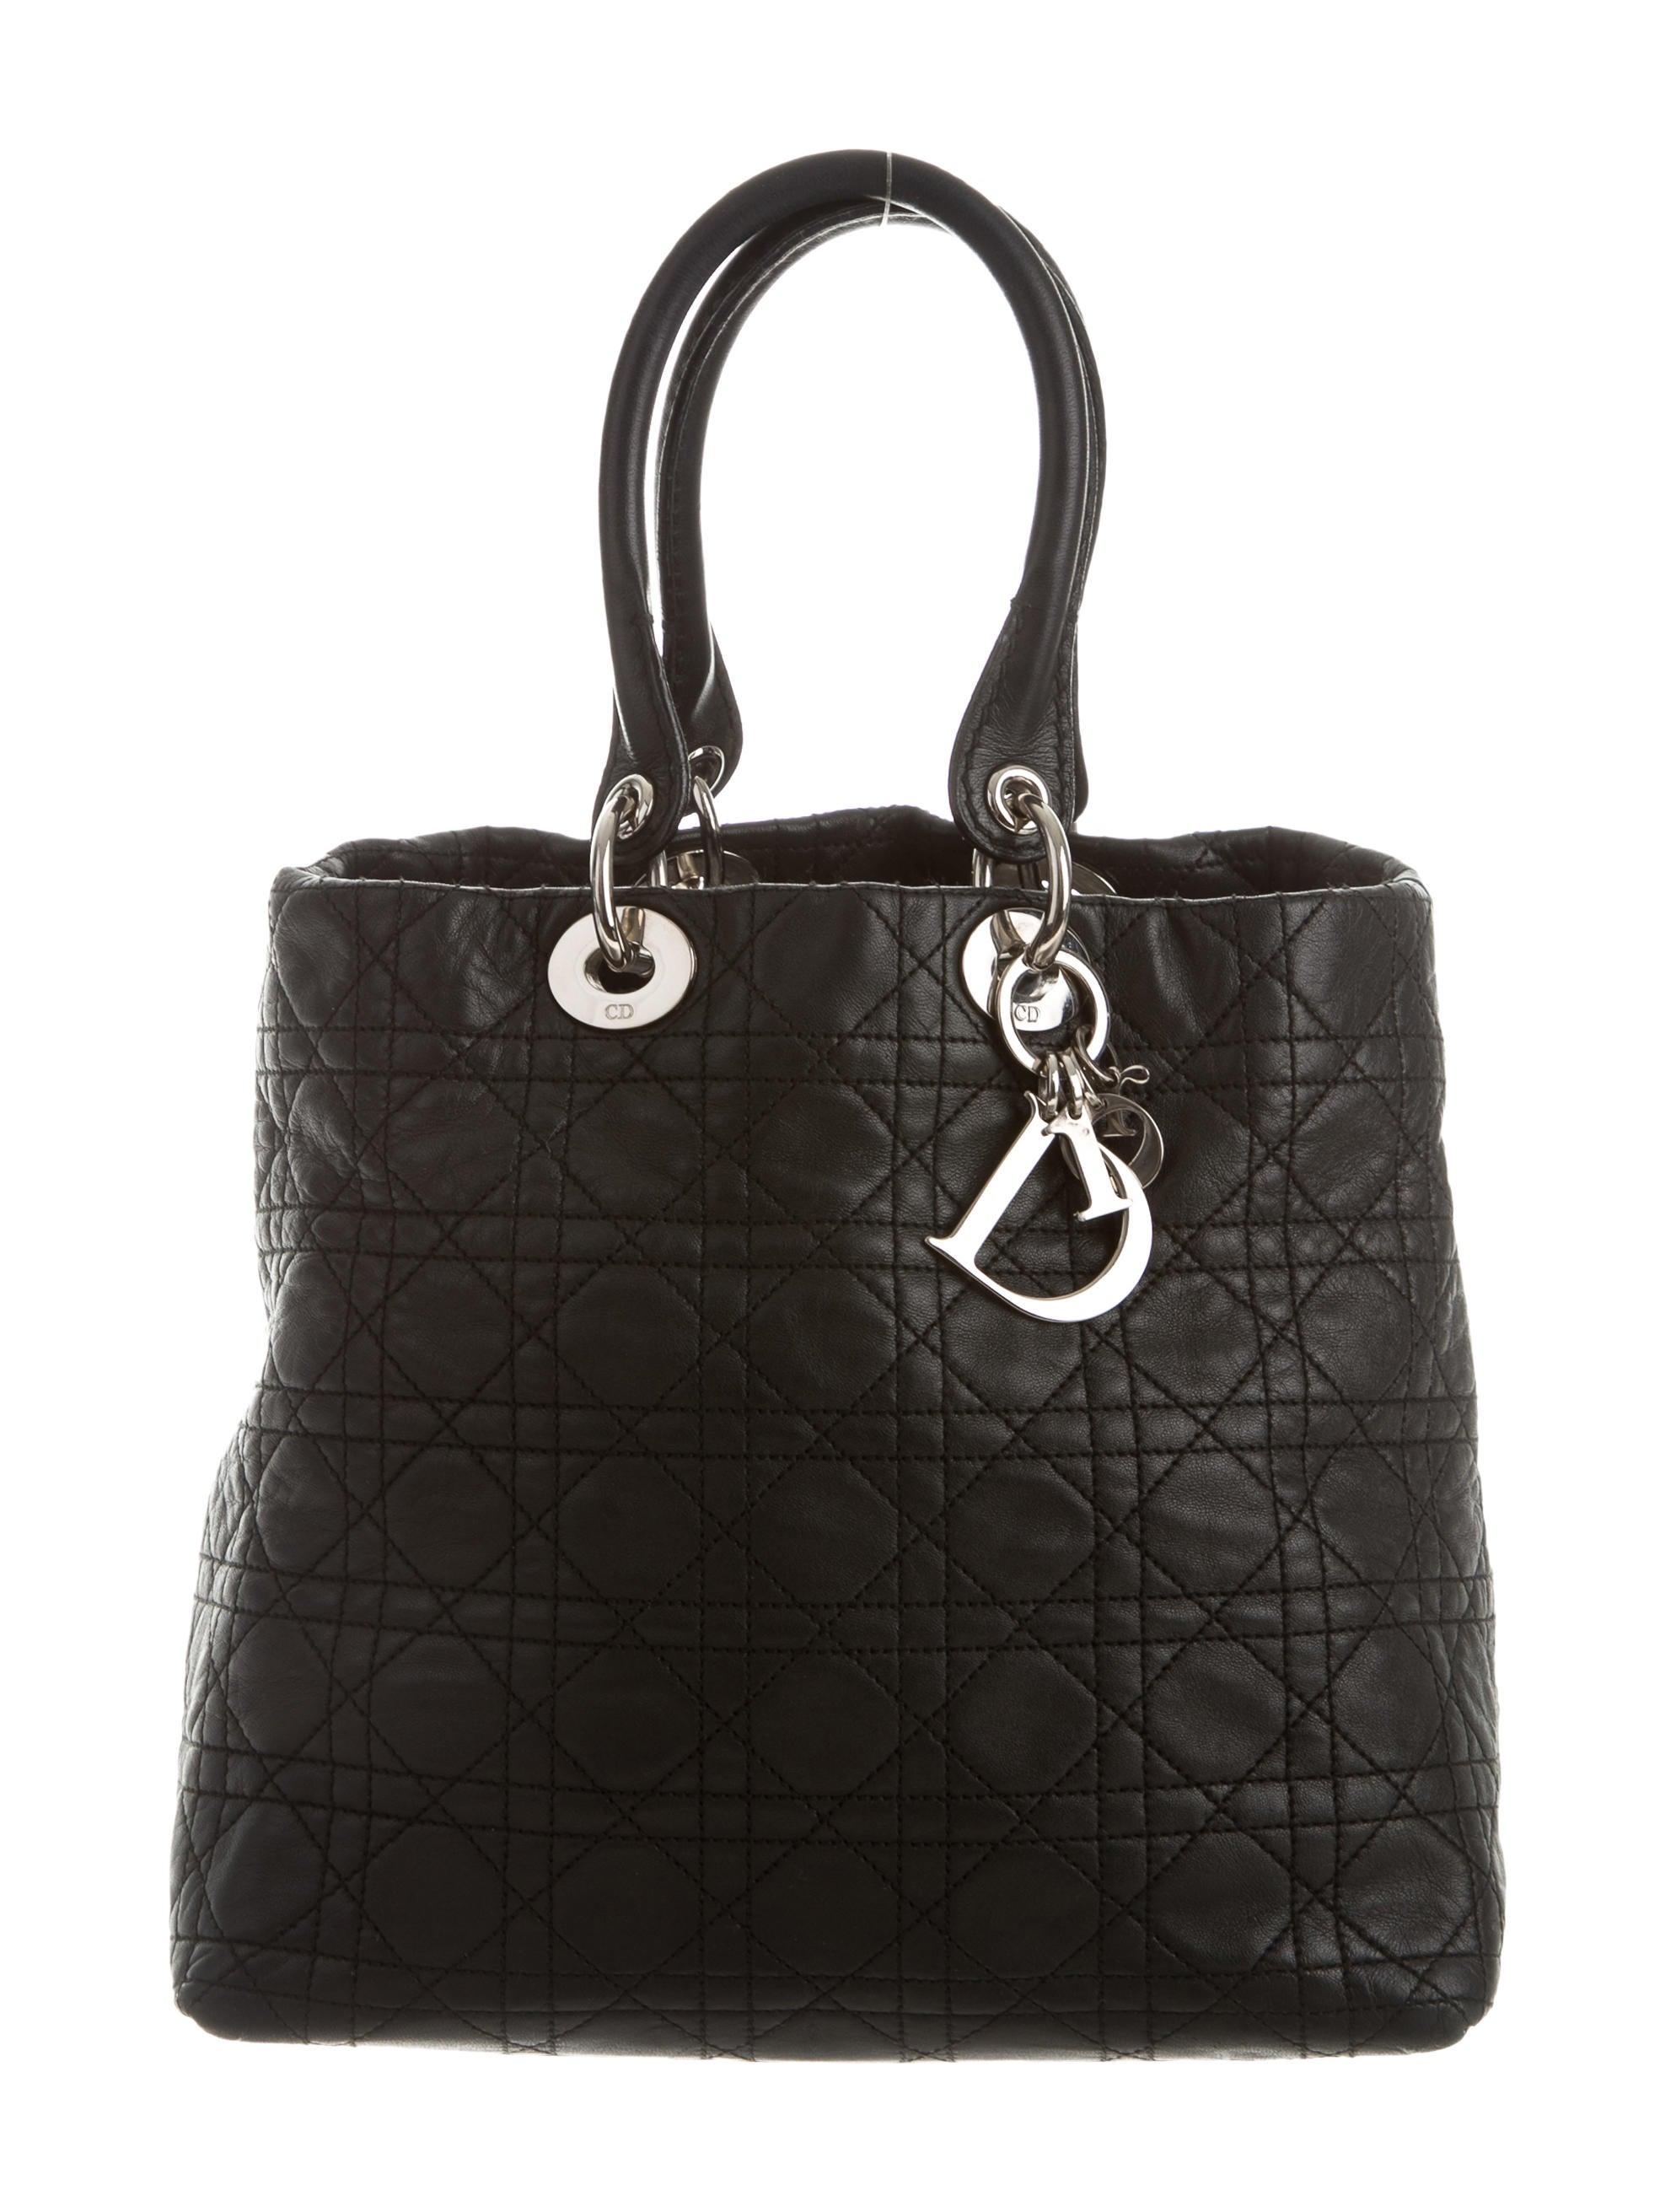 Christian Dior Soft Lady Dior Tote - Handbags - CHR44120 ...